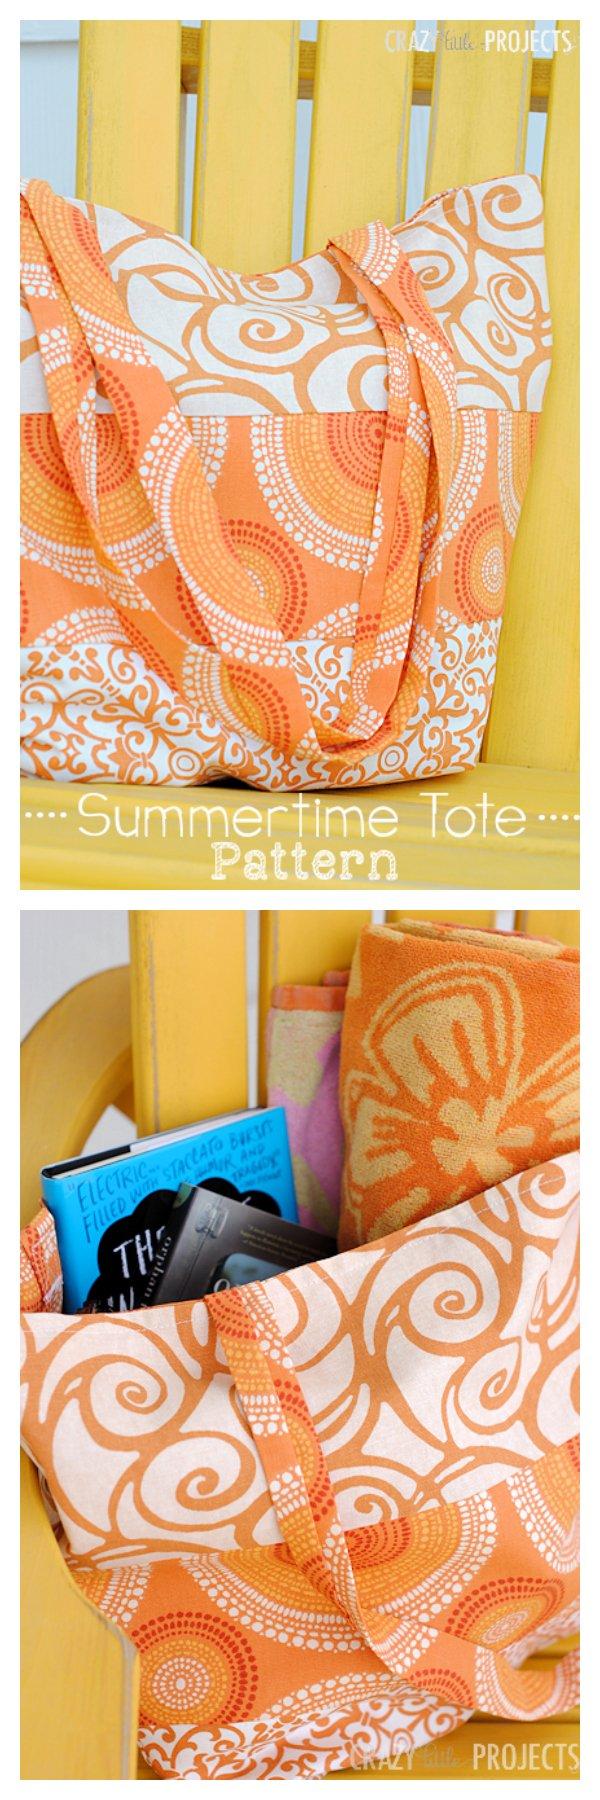 Summertime Tote Bag Tutorial